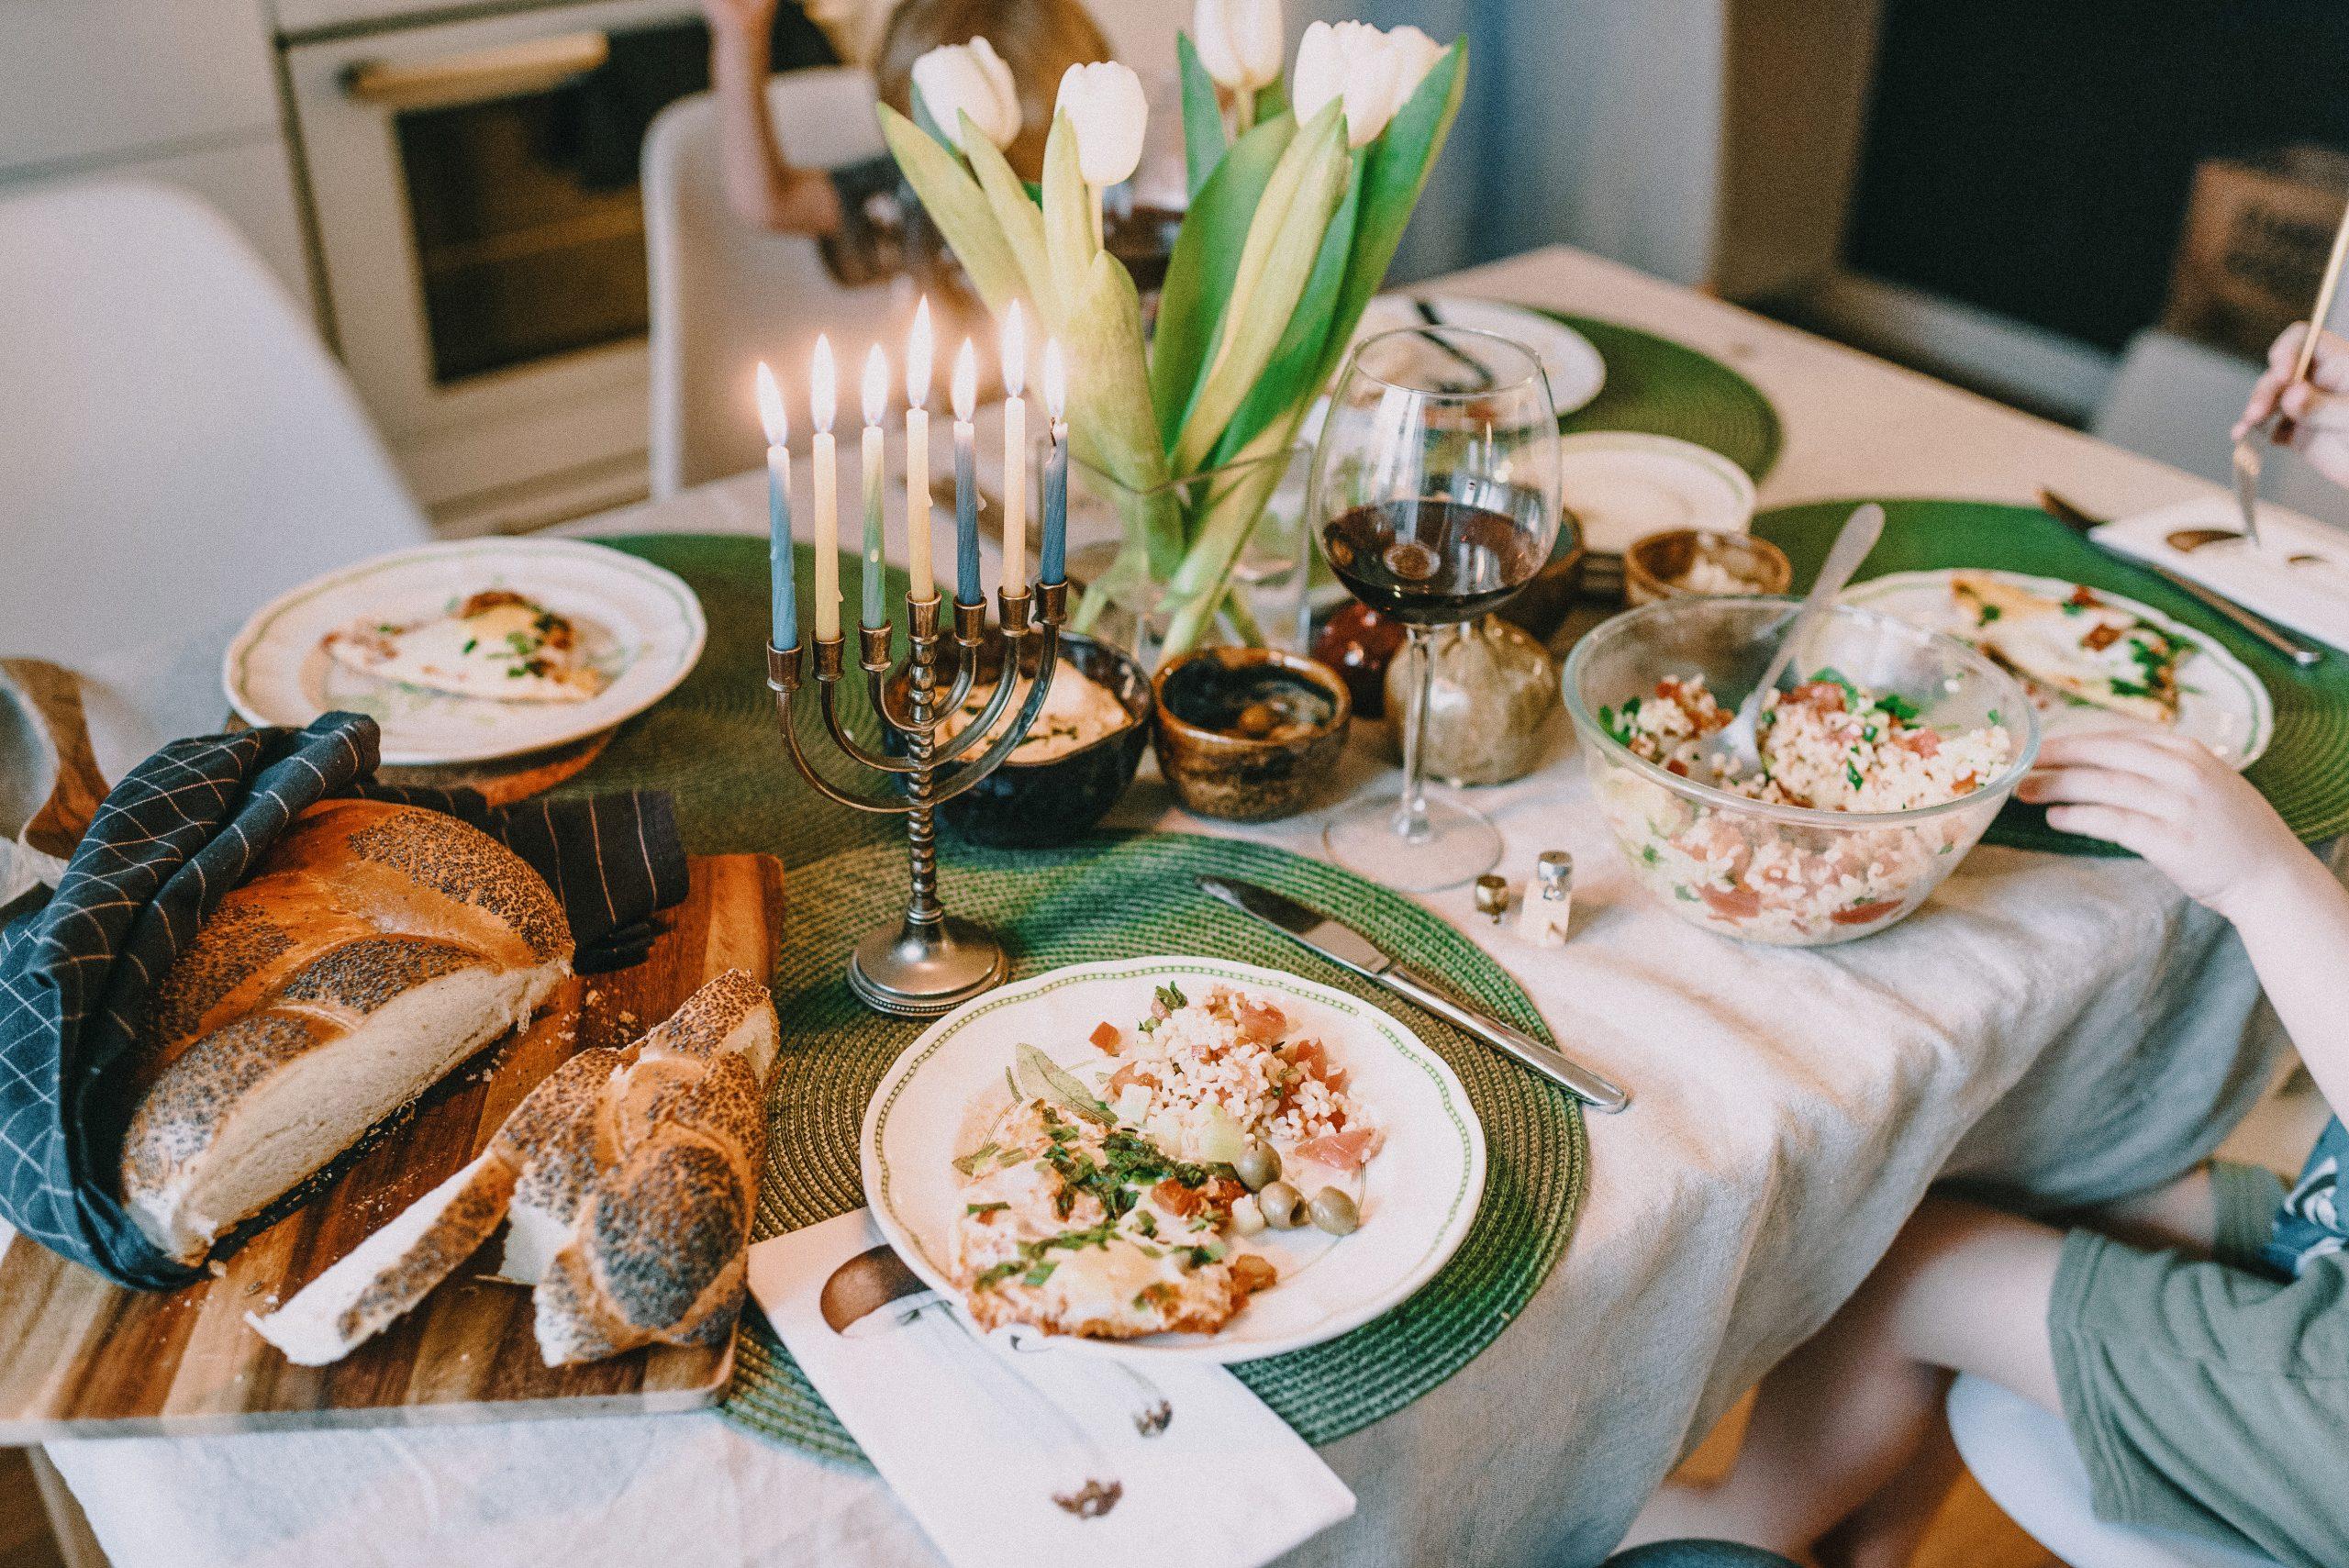 Hanukkah meal on dinner table